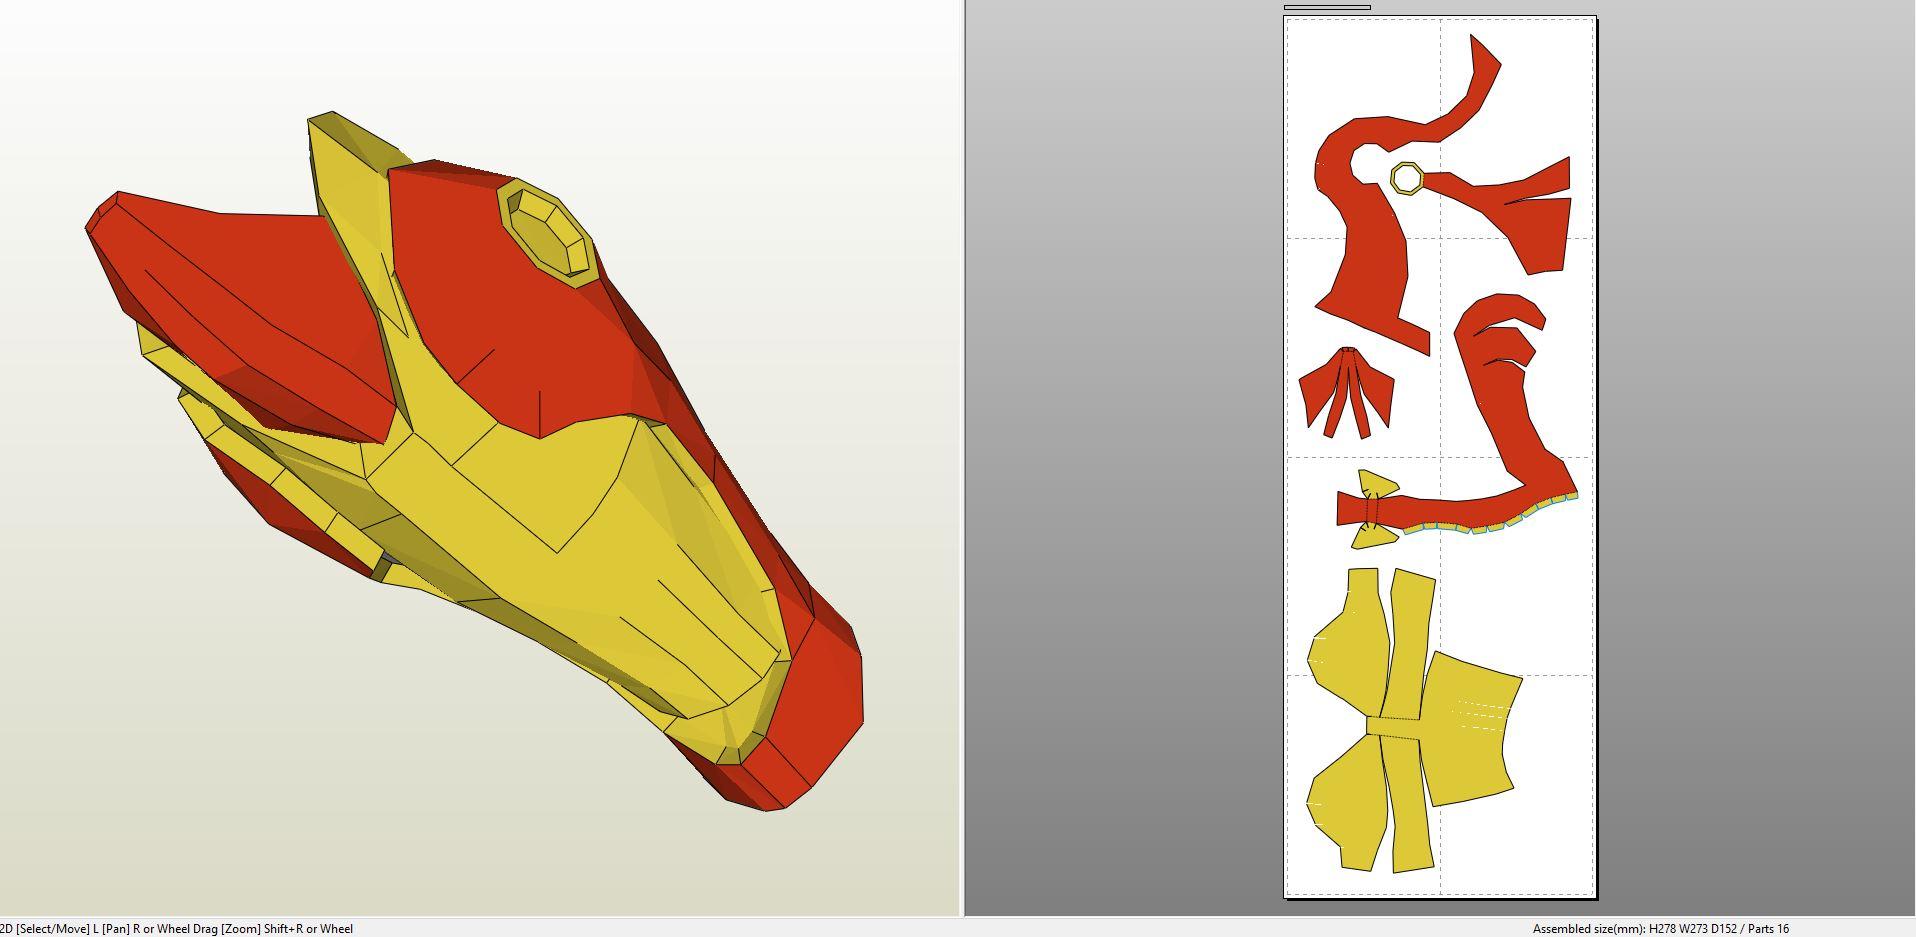 iron man foam armor templates - iron man extremis armor foam